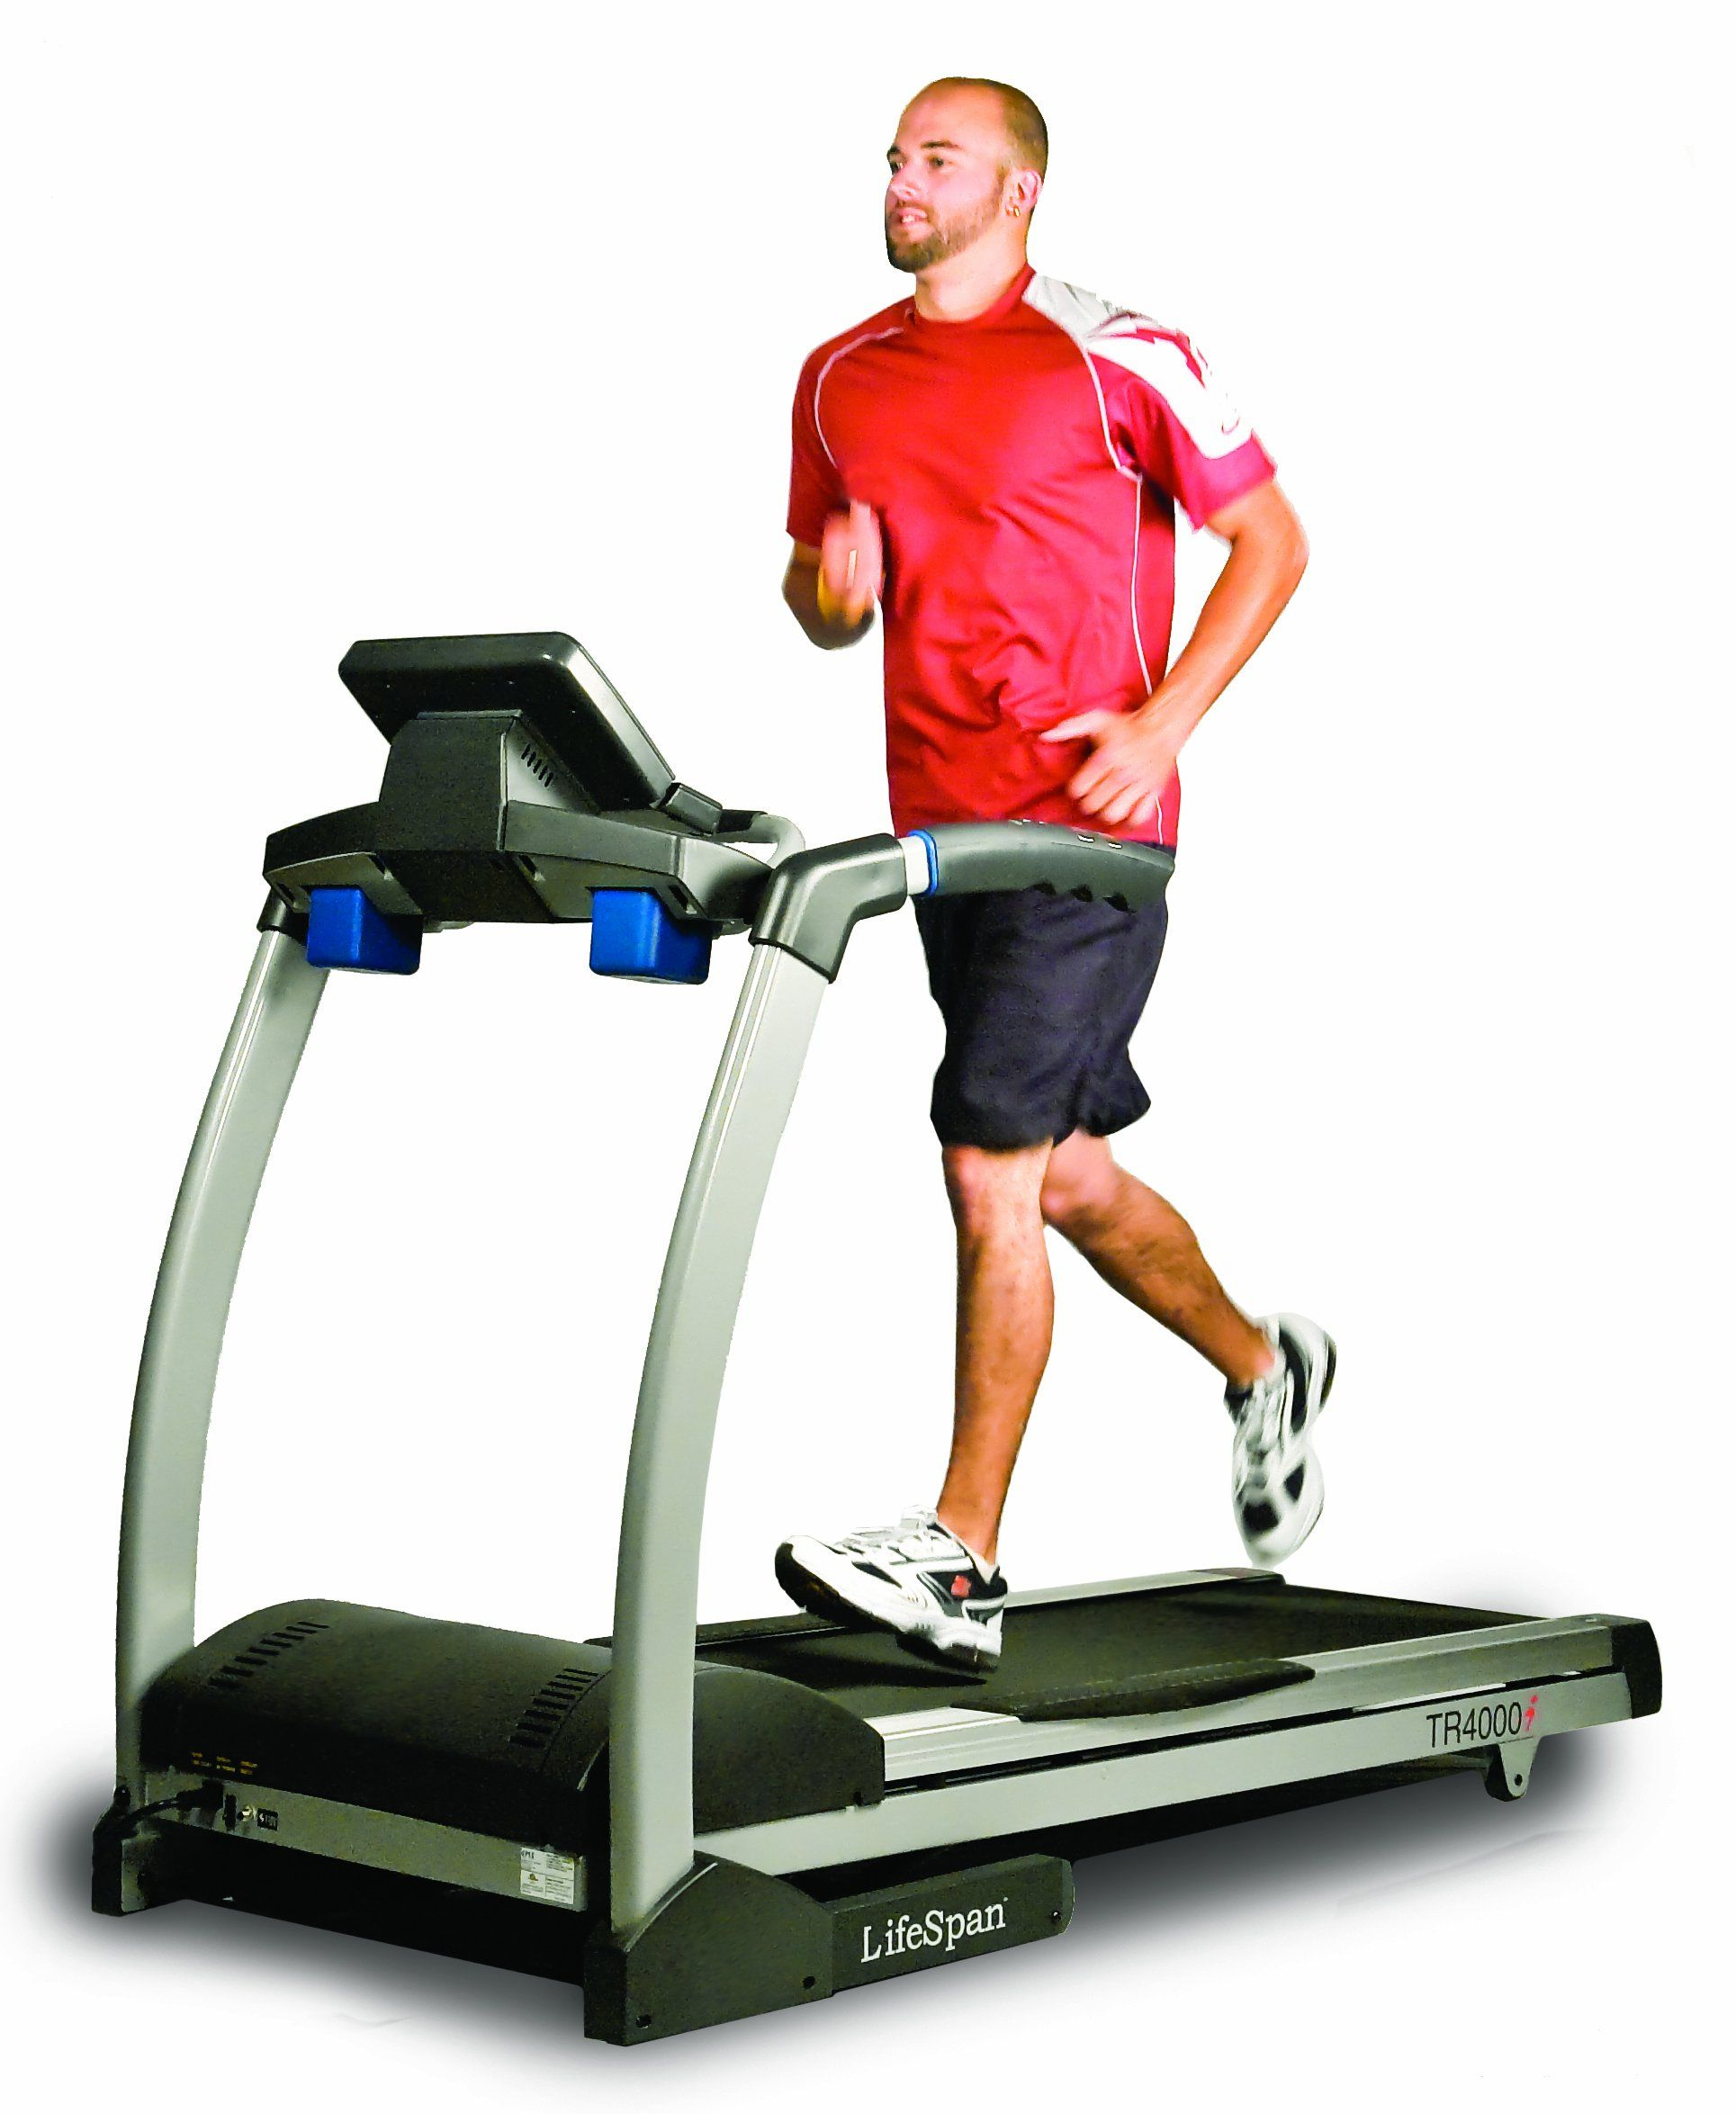 Lifespan Tr4000i Folding Treadmill By Lifespan Fitness 43 Customer Reviews 29 Answered Ques Good Treadmills Folding Treadmill Treadmill Reviews